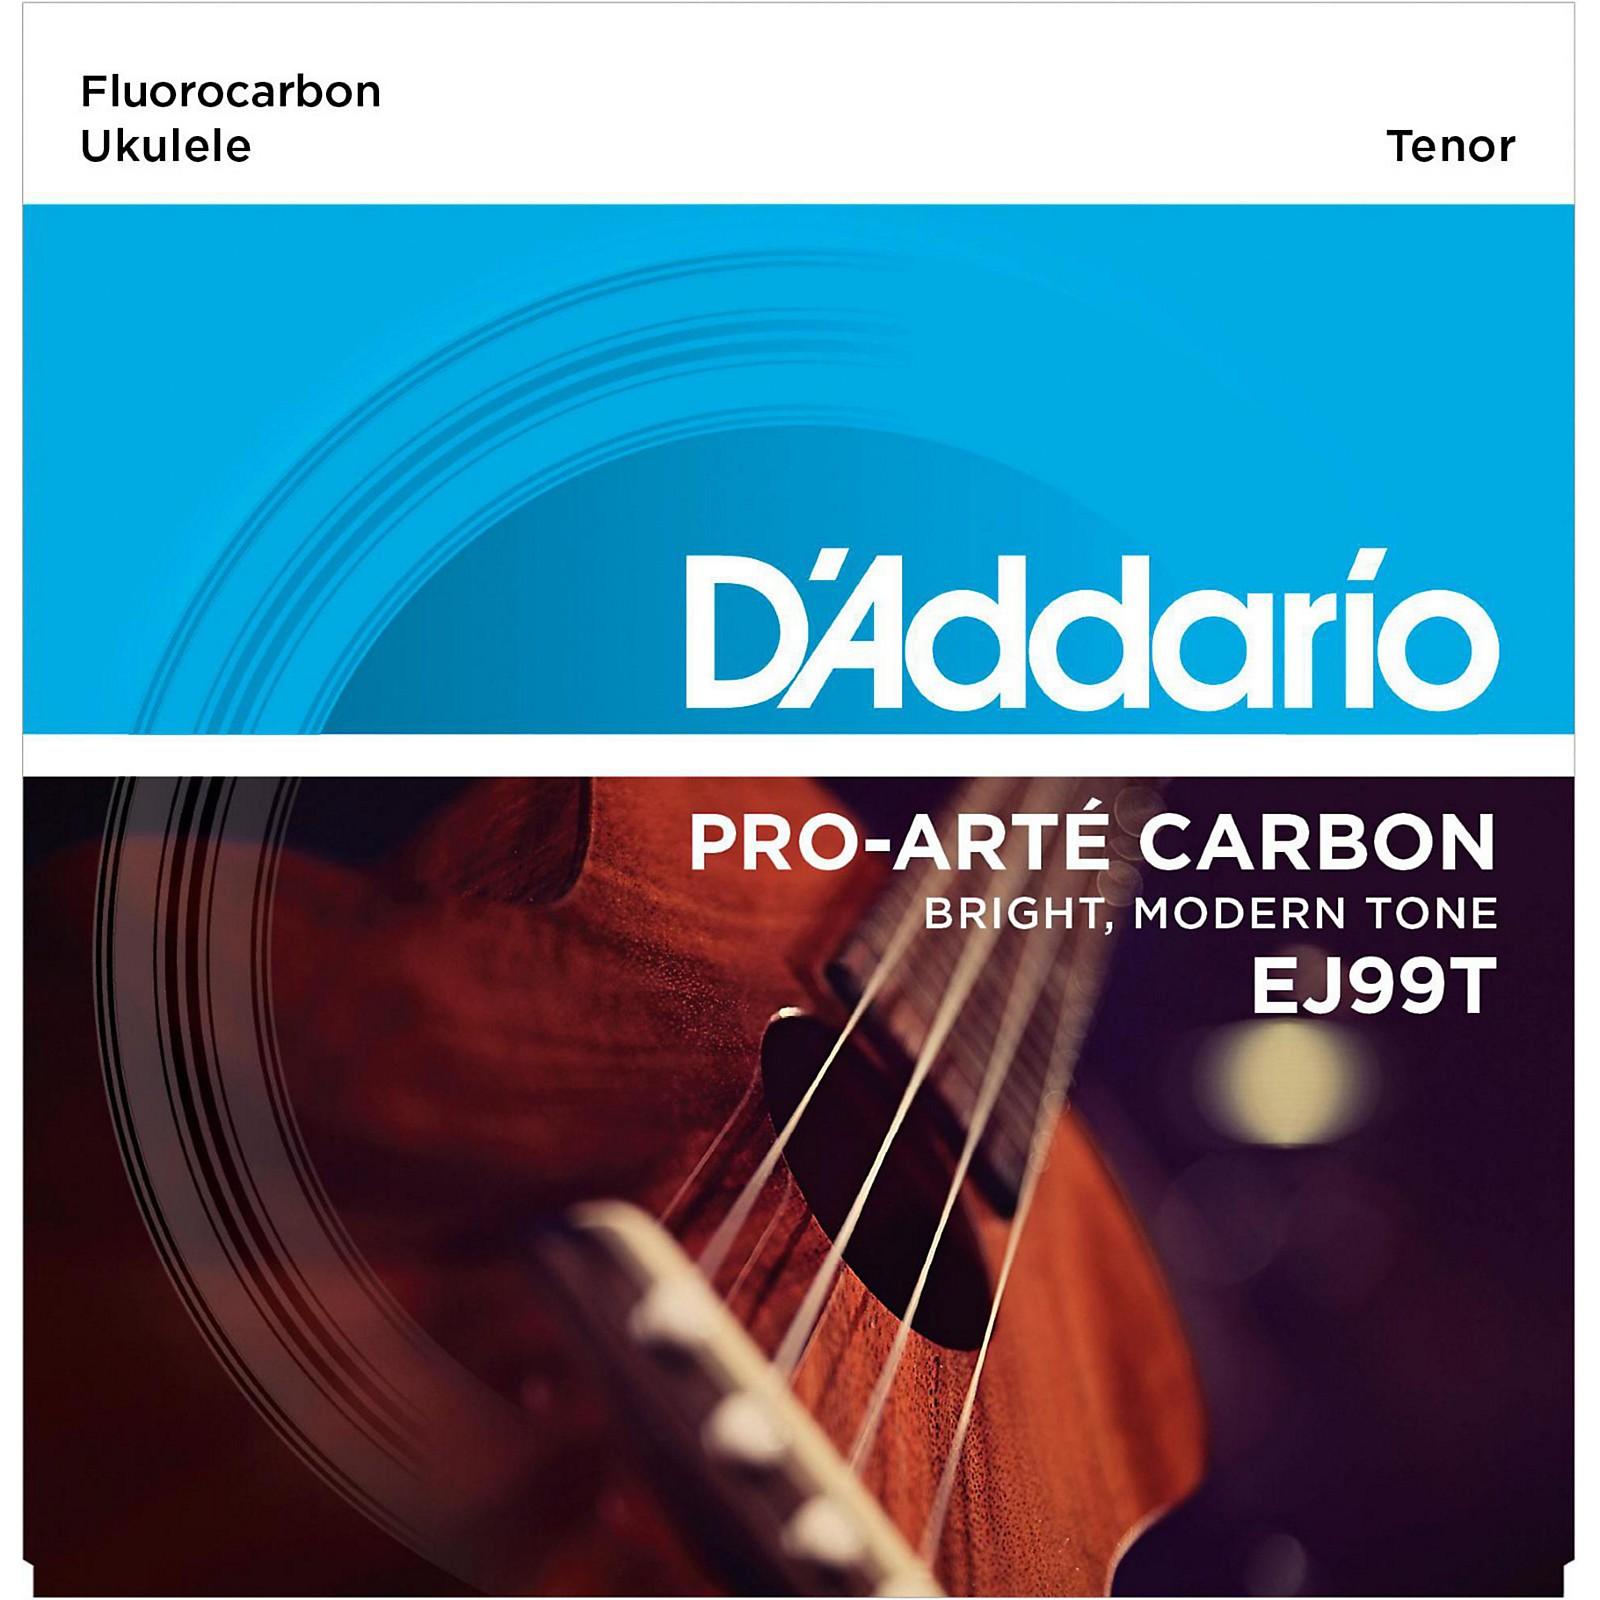 D'Addario EJ99T Pro-Arte Carbon Tenor Ukulele Strings